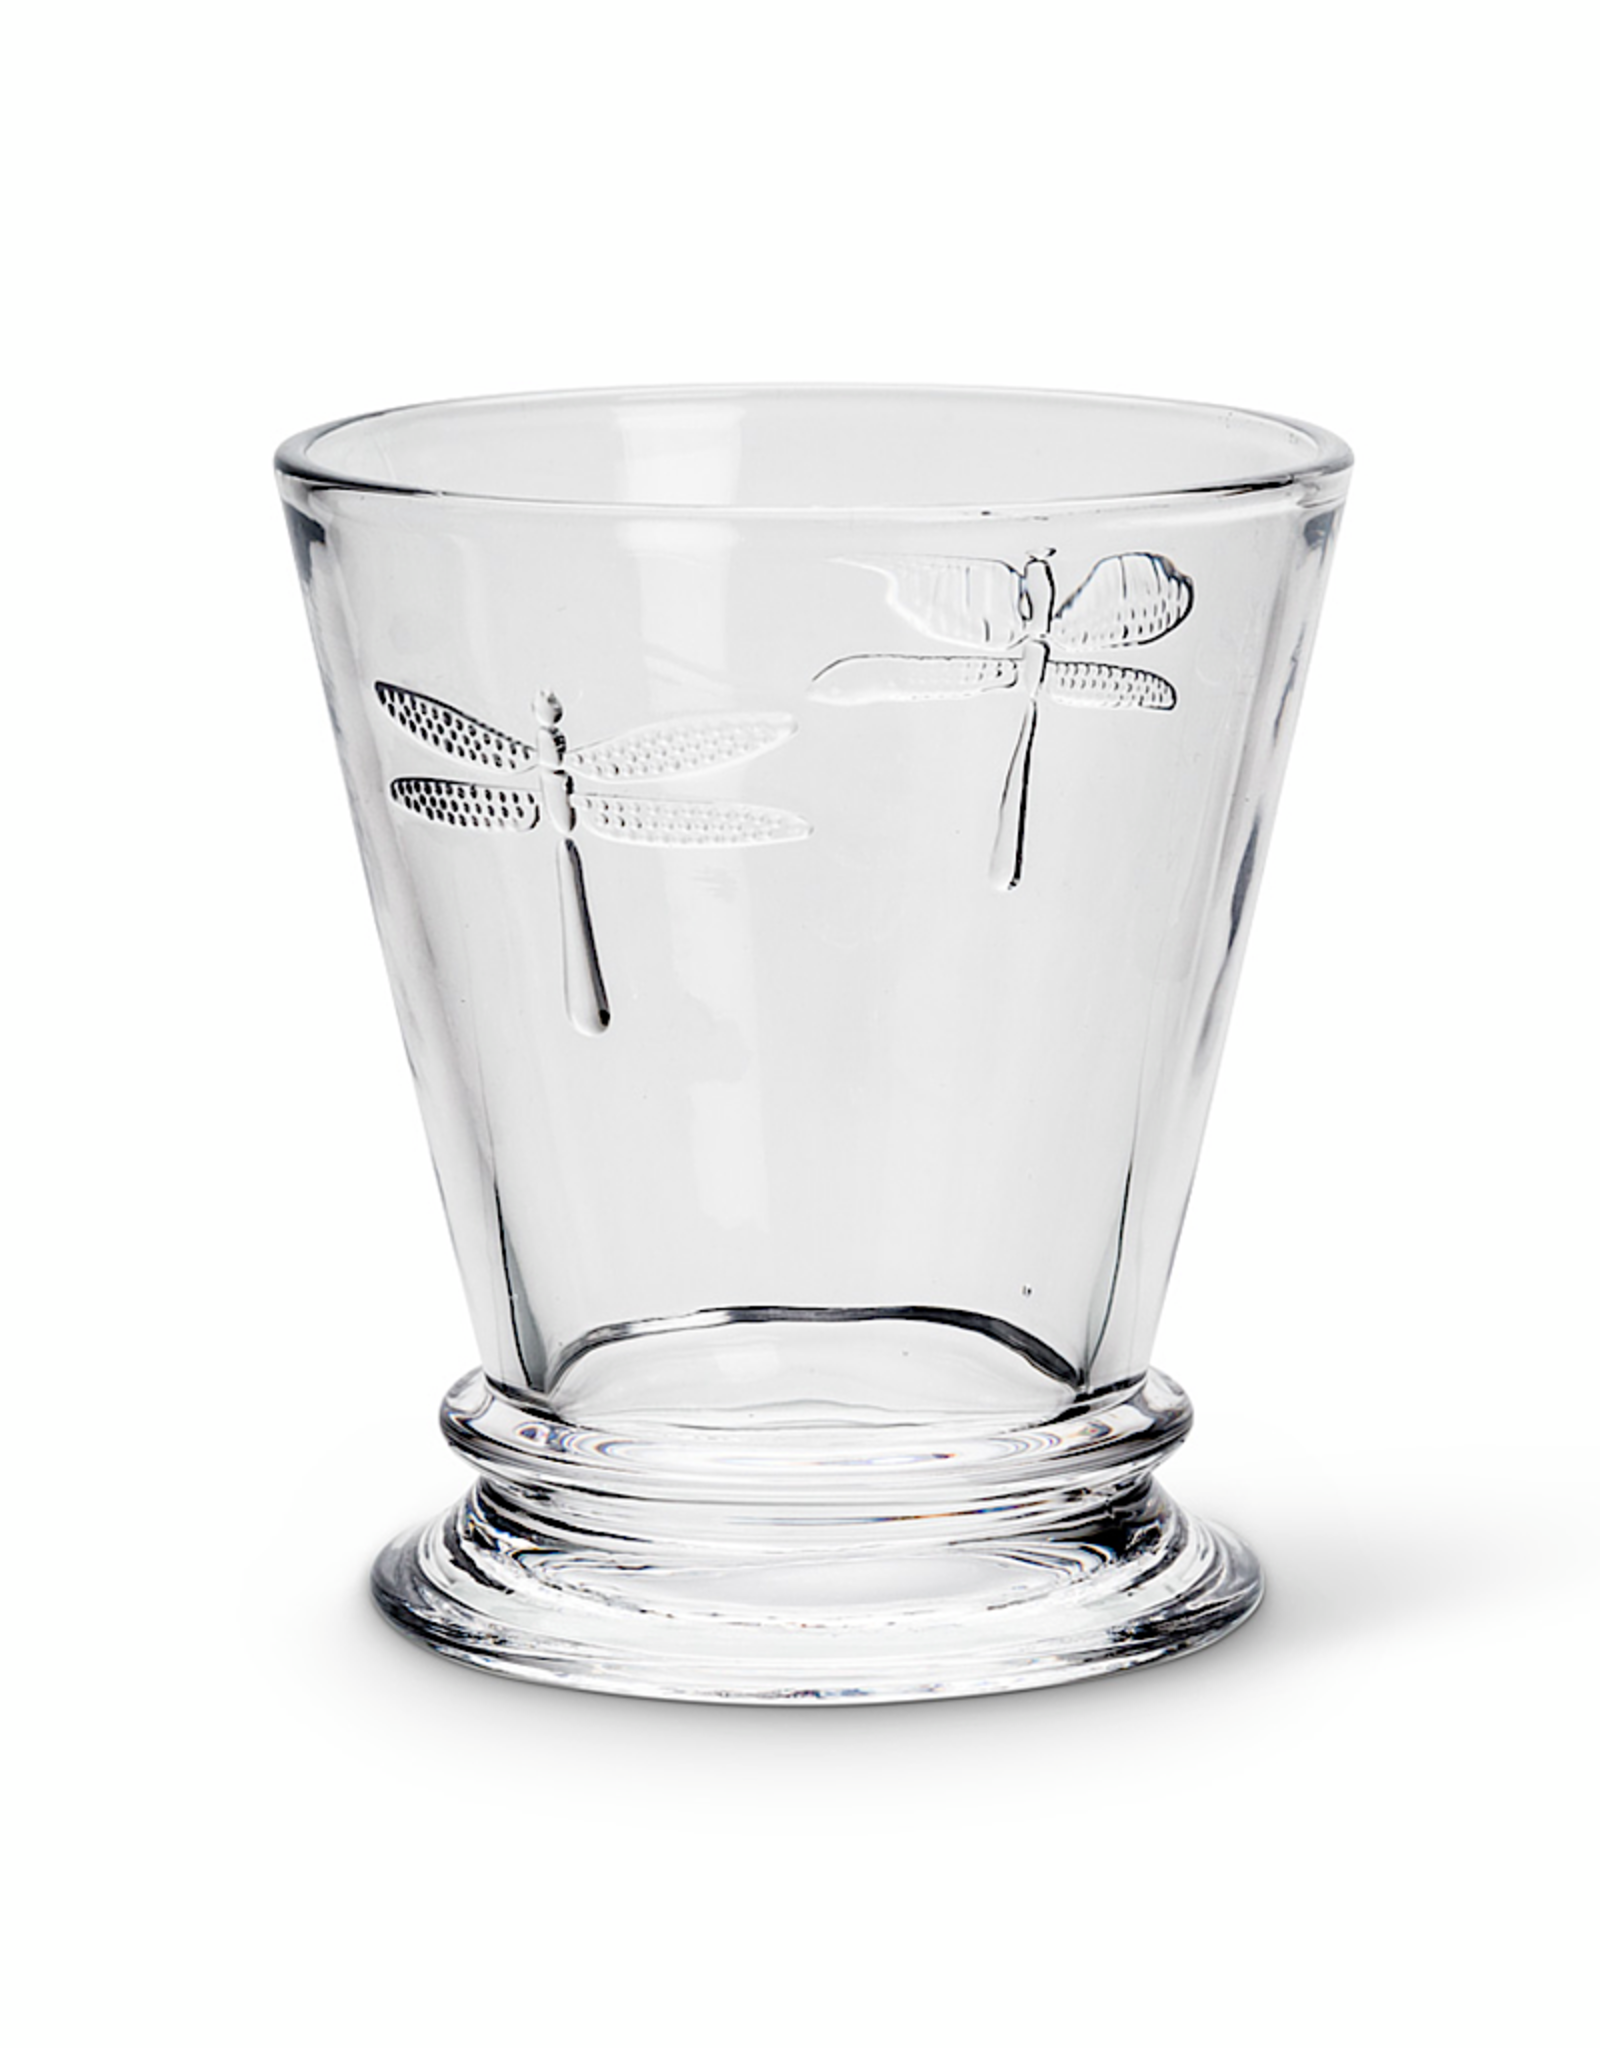 "Dragonfly Glass Tumbler 4"" 8oz"